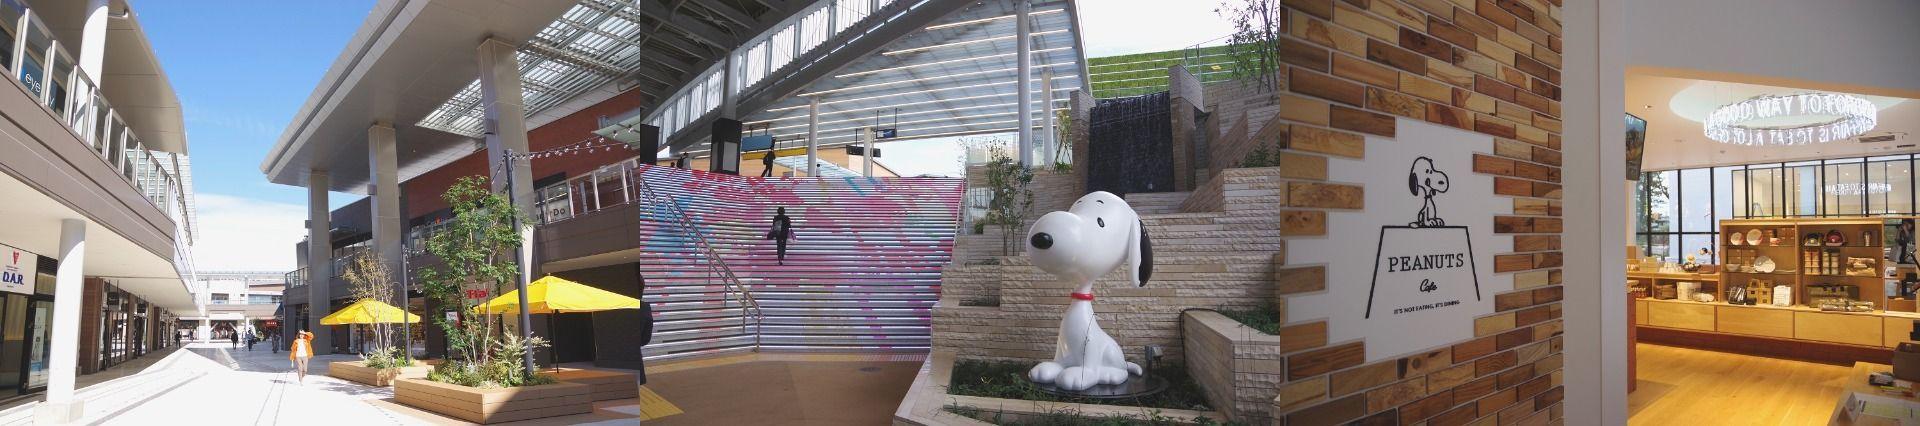 Minami-machida Grandberry Park- from Cinemas, Famous Restaurants to Mascot Specialties!